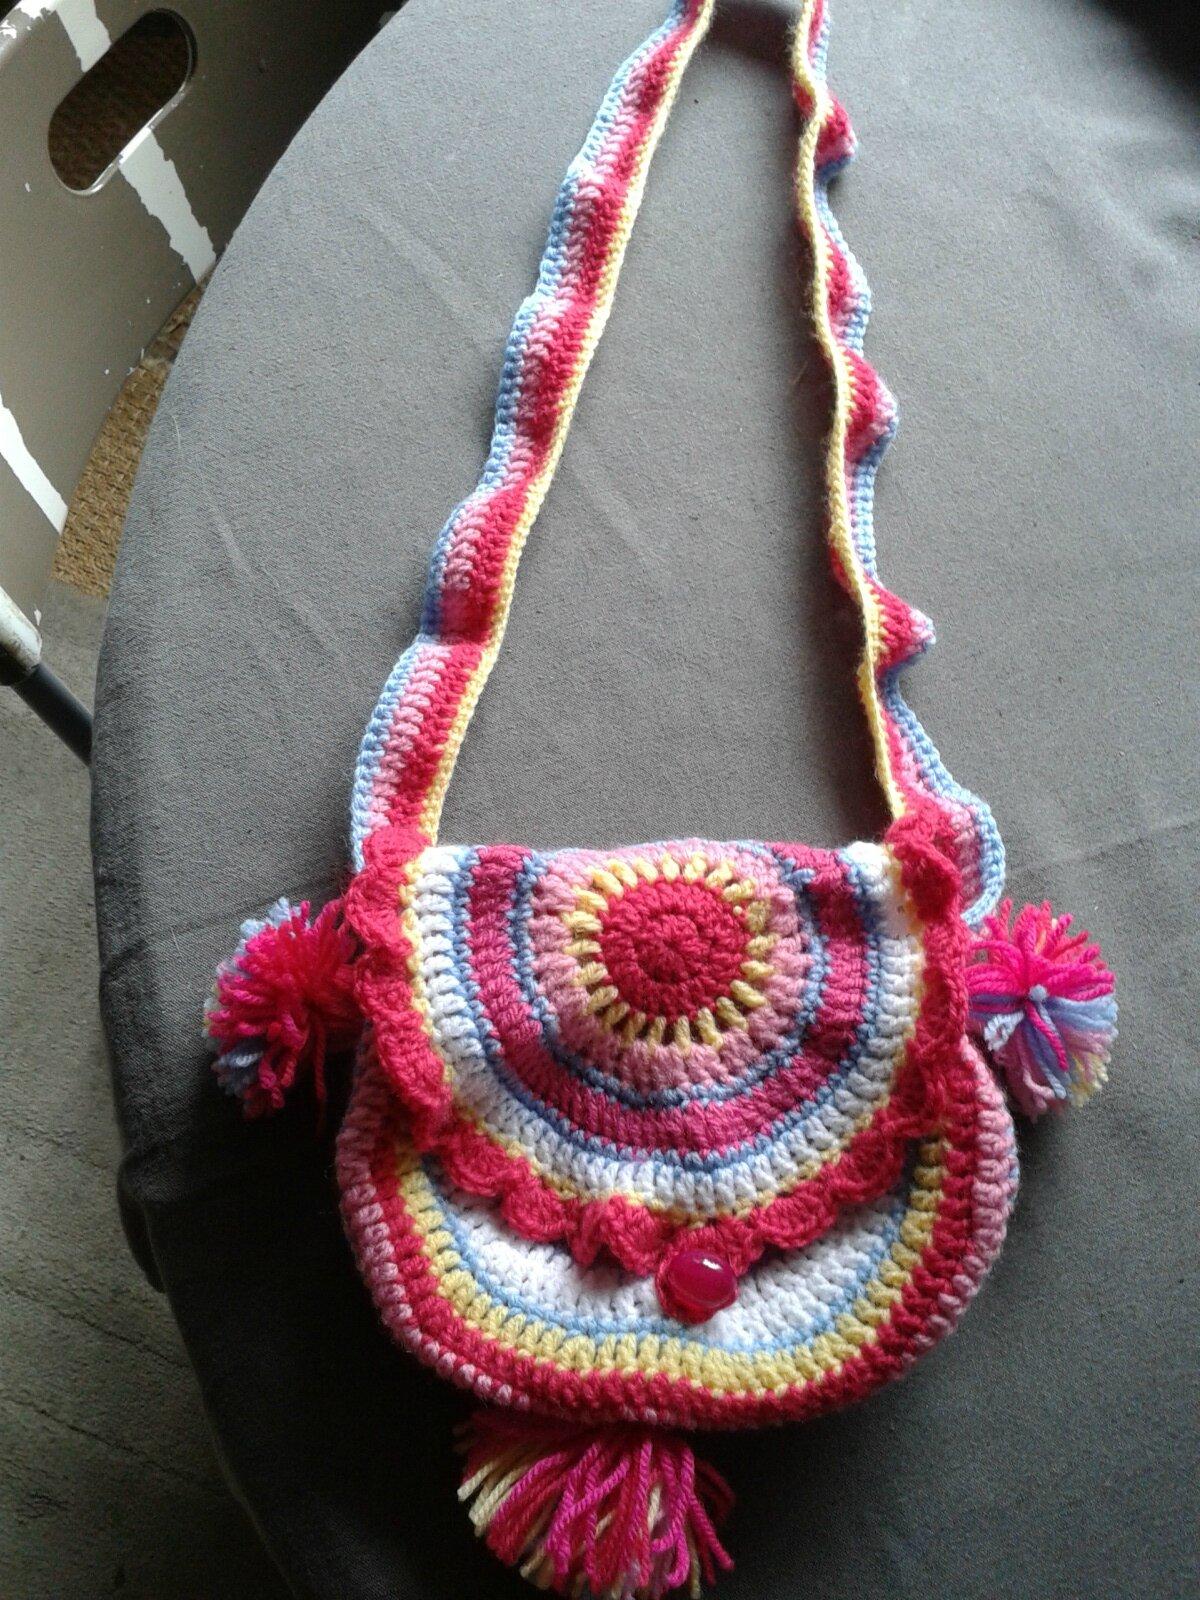 Connu petit sac pour petite fille - Granny mania ! PA99